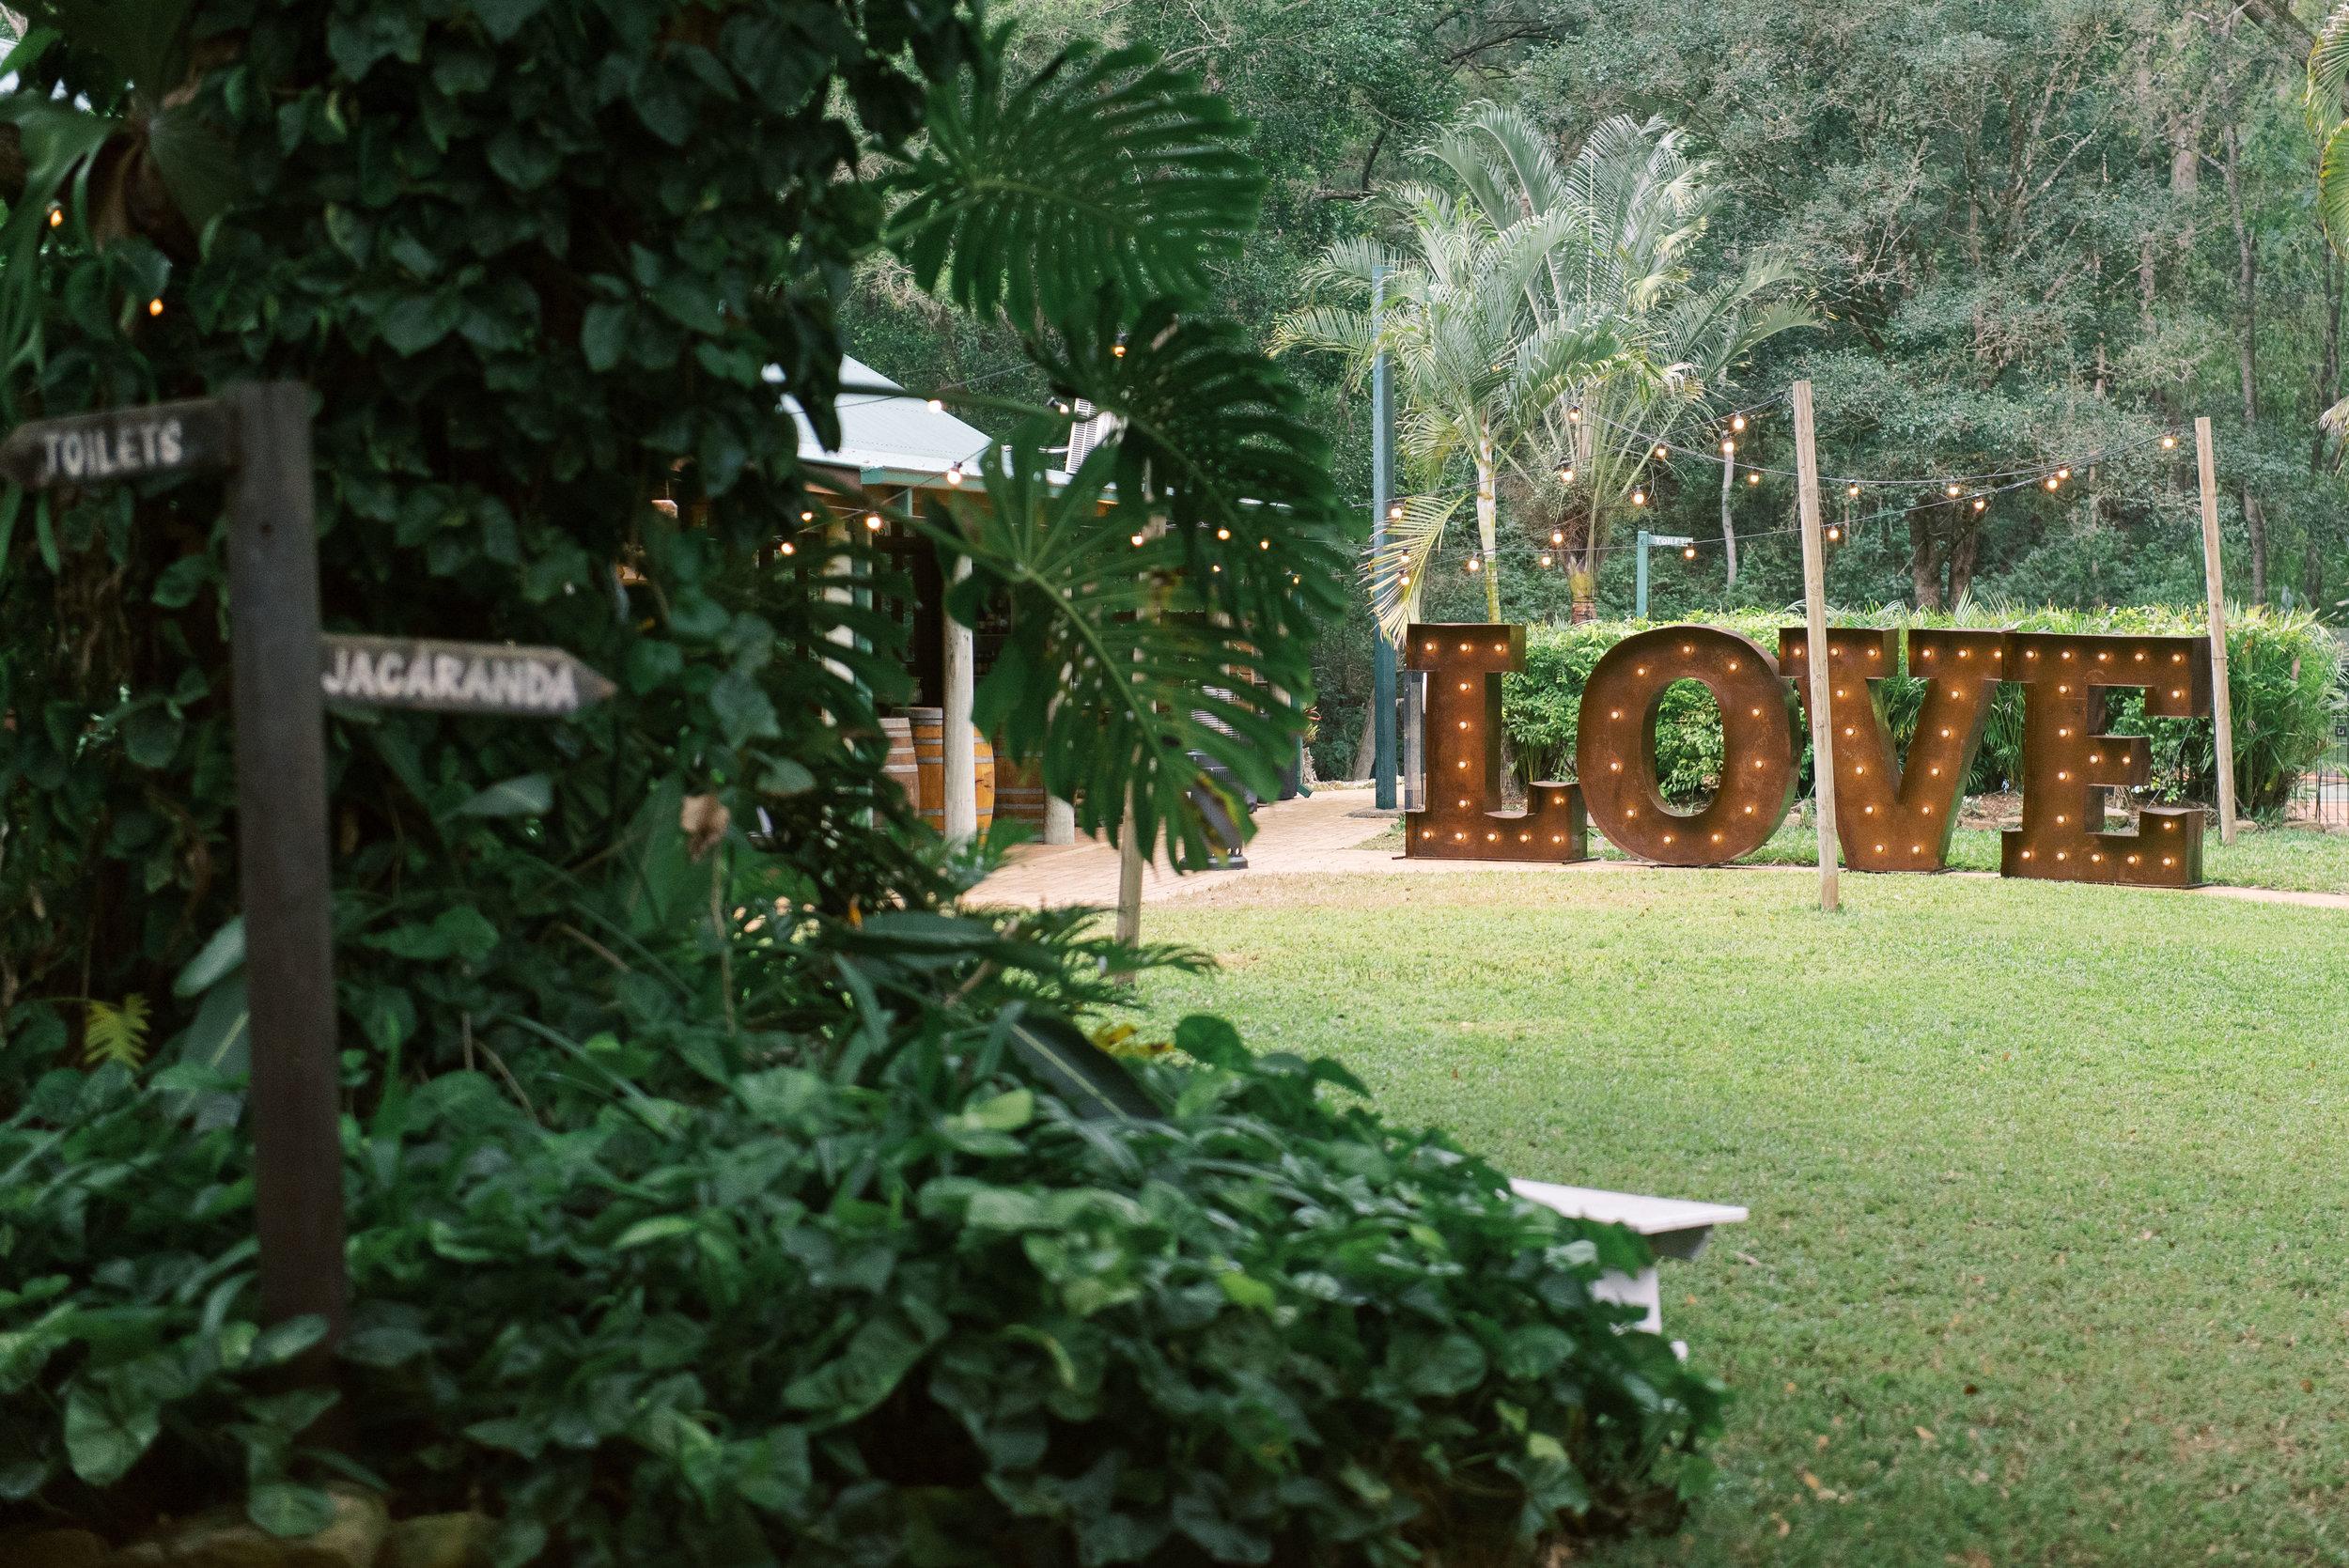 brisbane-gold-coast-sunshine-coast-romantic-wedding-photographer-39.jpg